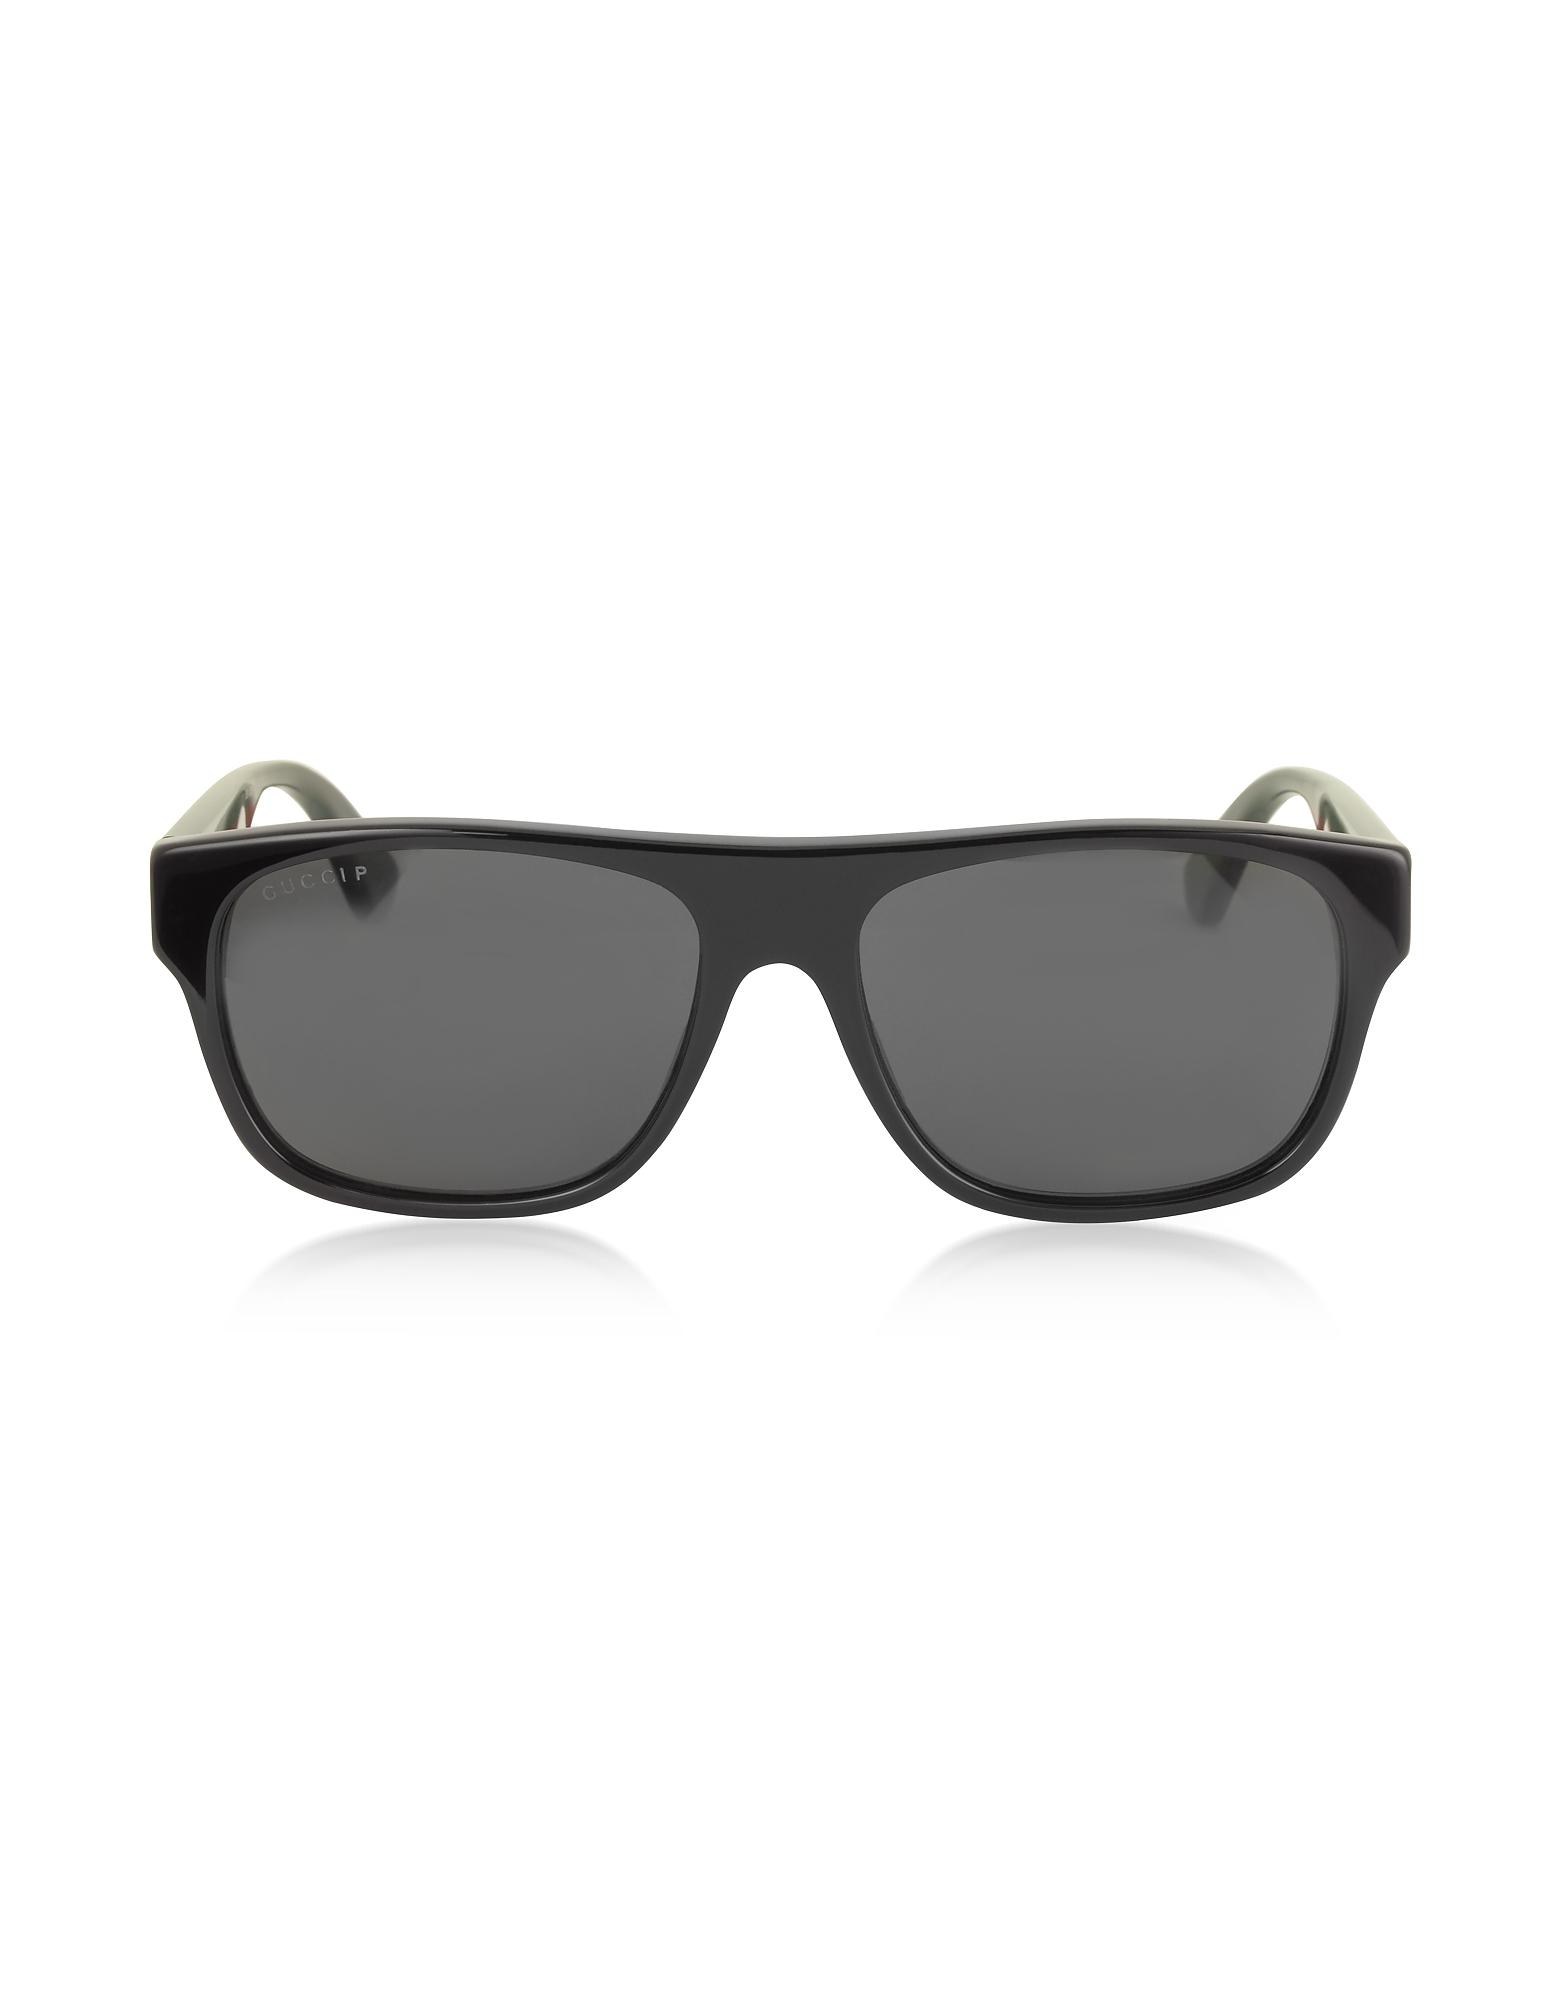 Gucci Sunglasses, GG0341S Rectangular-frame Acetate Sunglasses